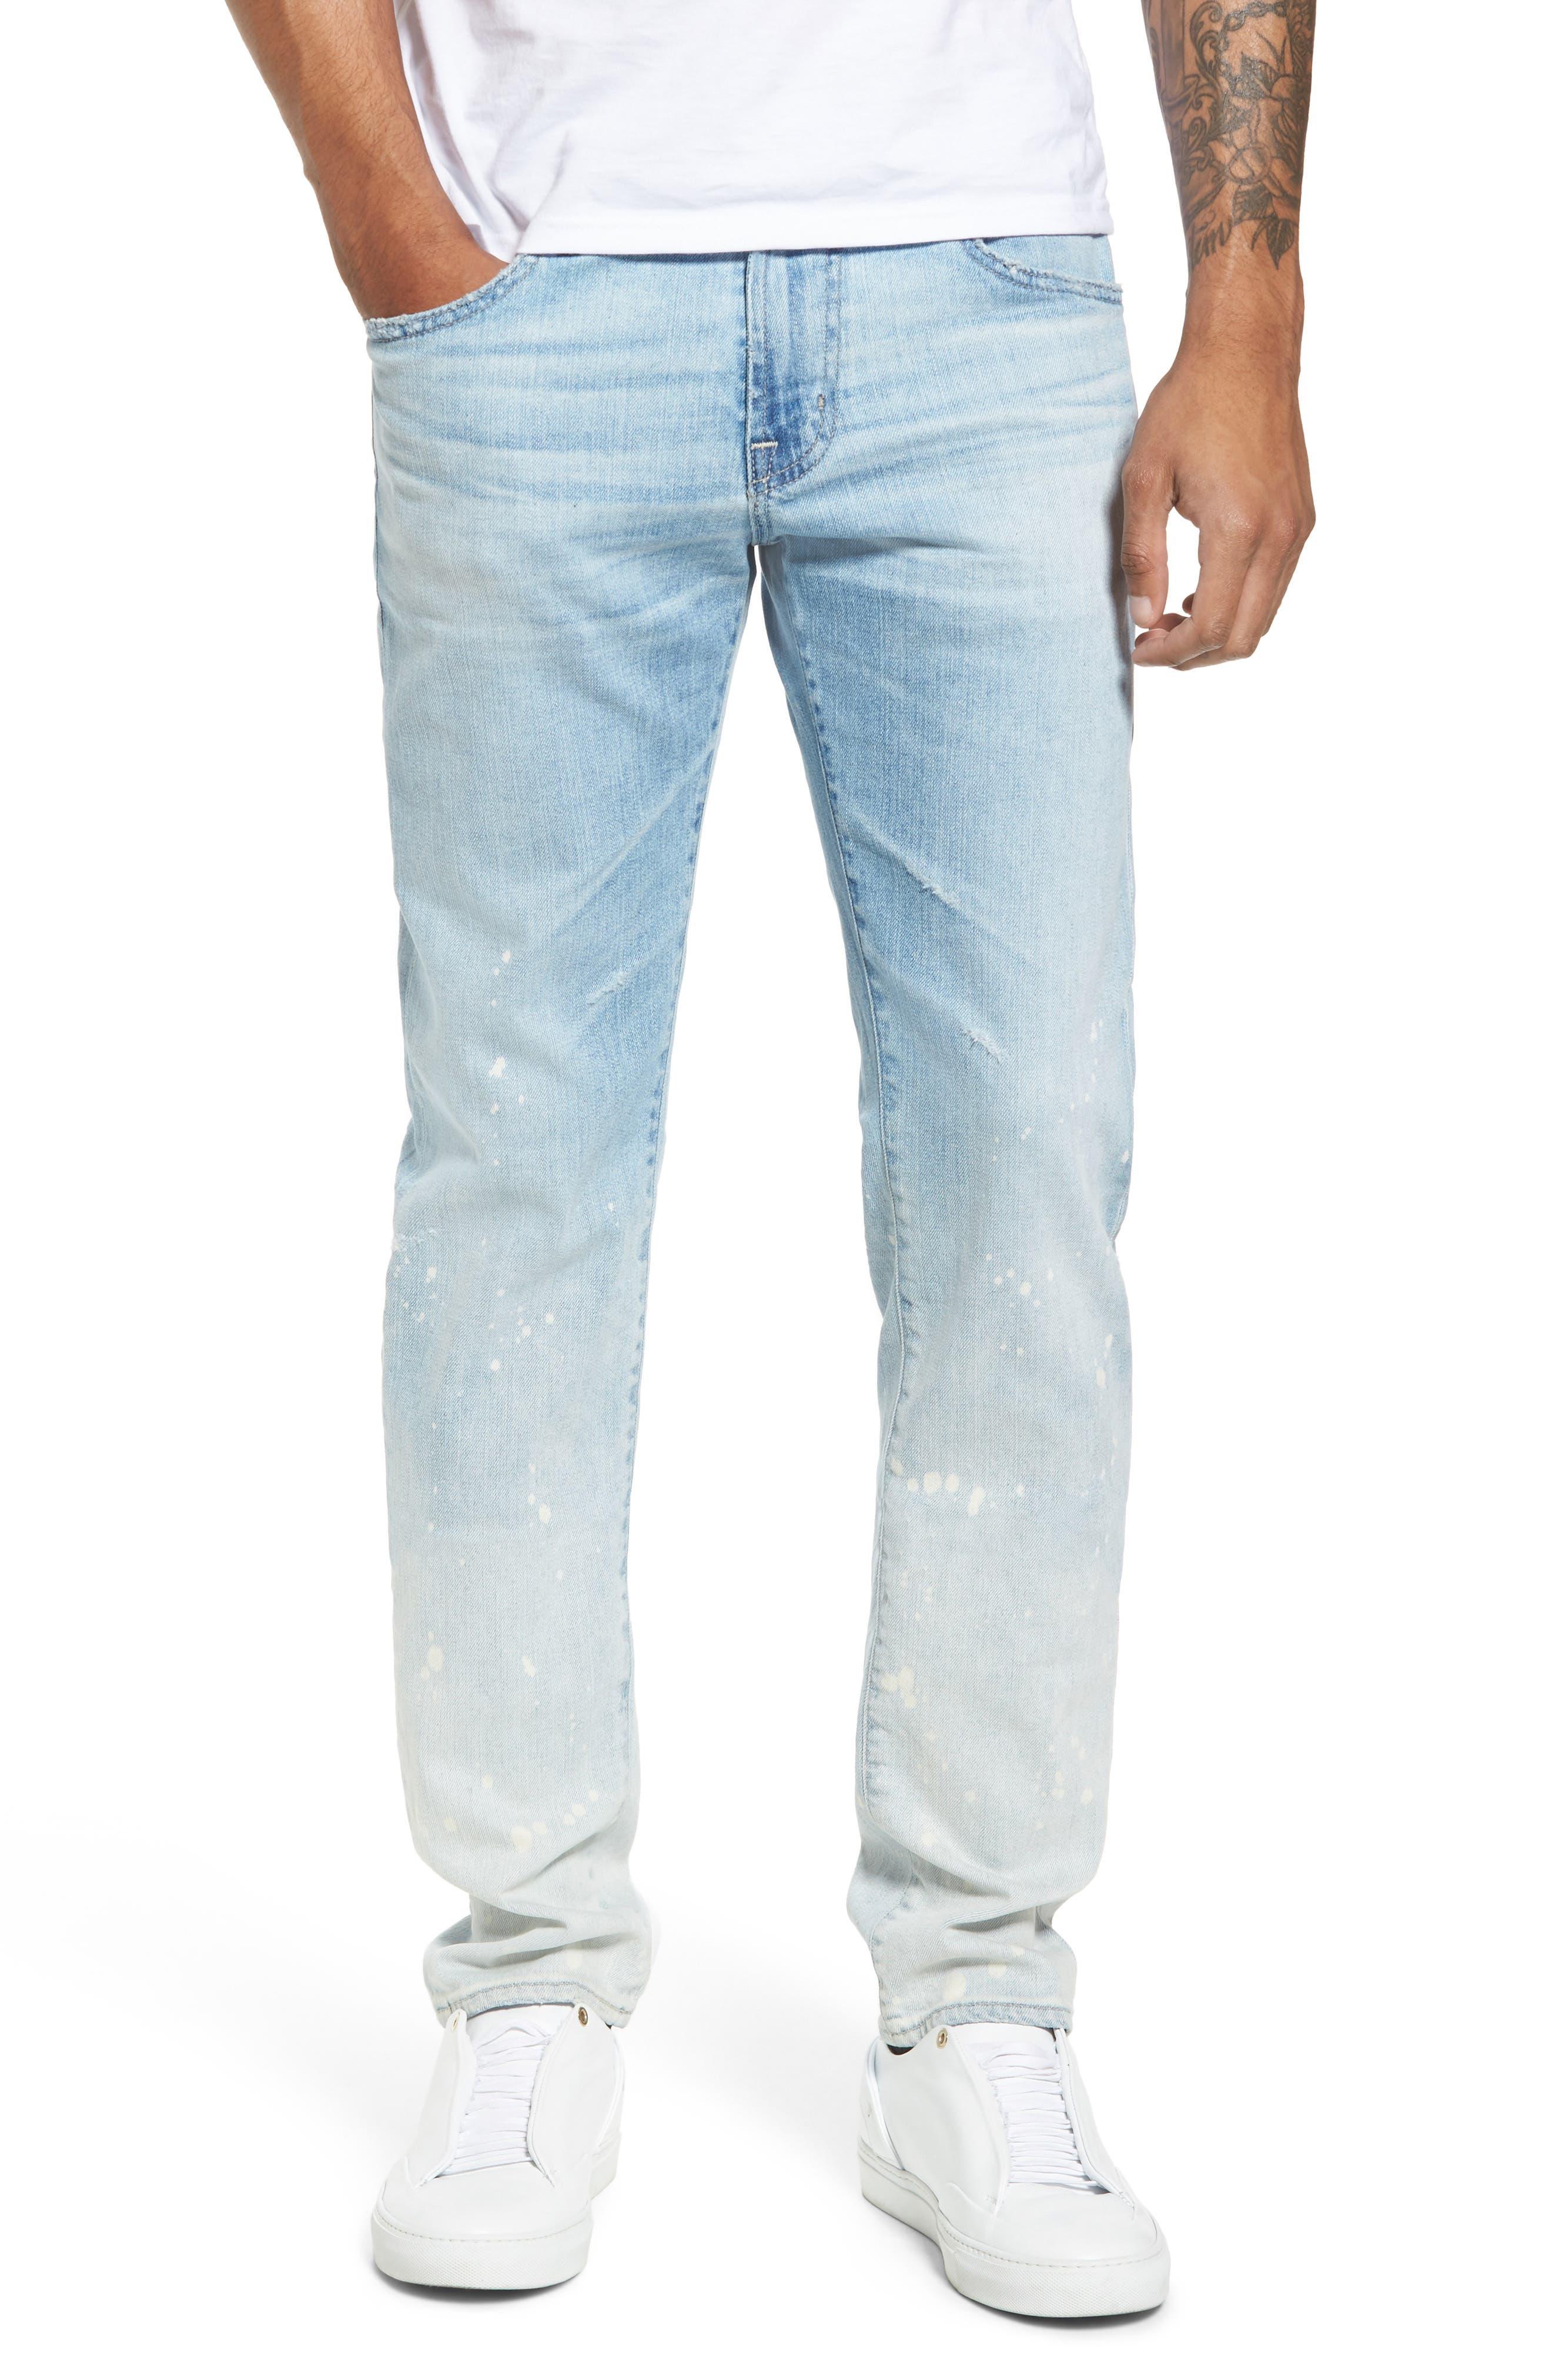 Dylan Slim Skinny Fit Jeans,                             Main thumbnail 1, color,                             23 Years Oceanside